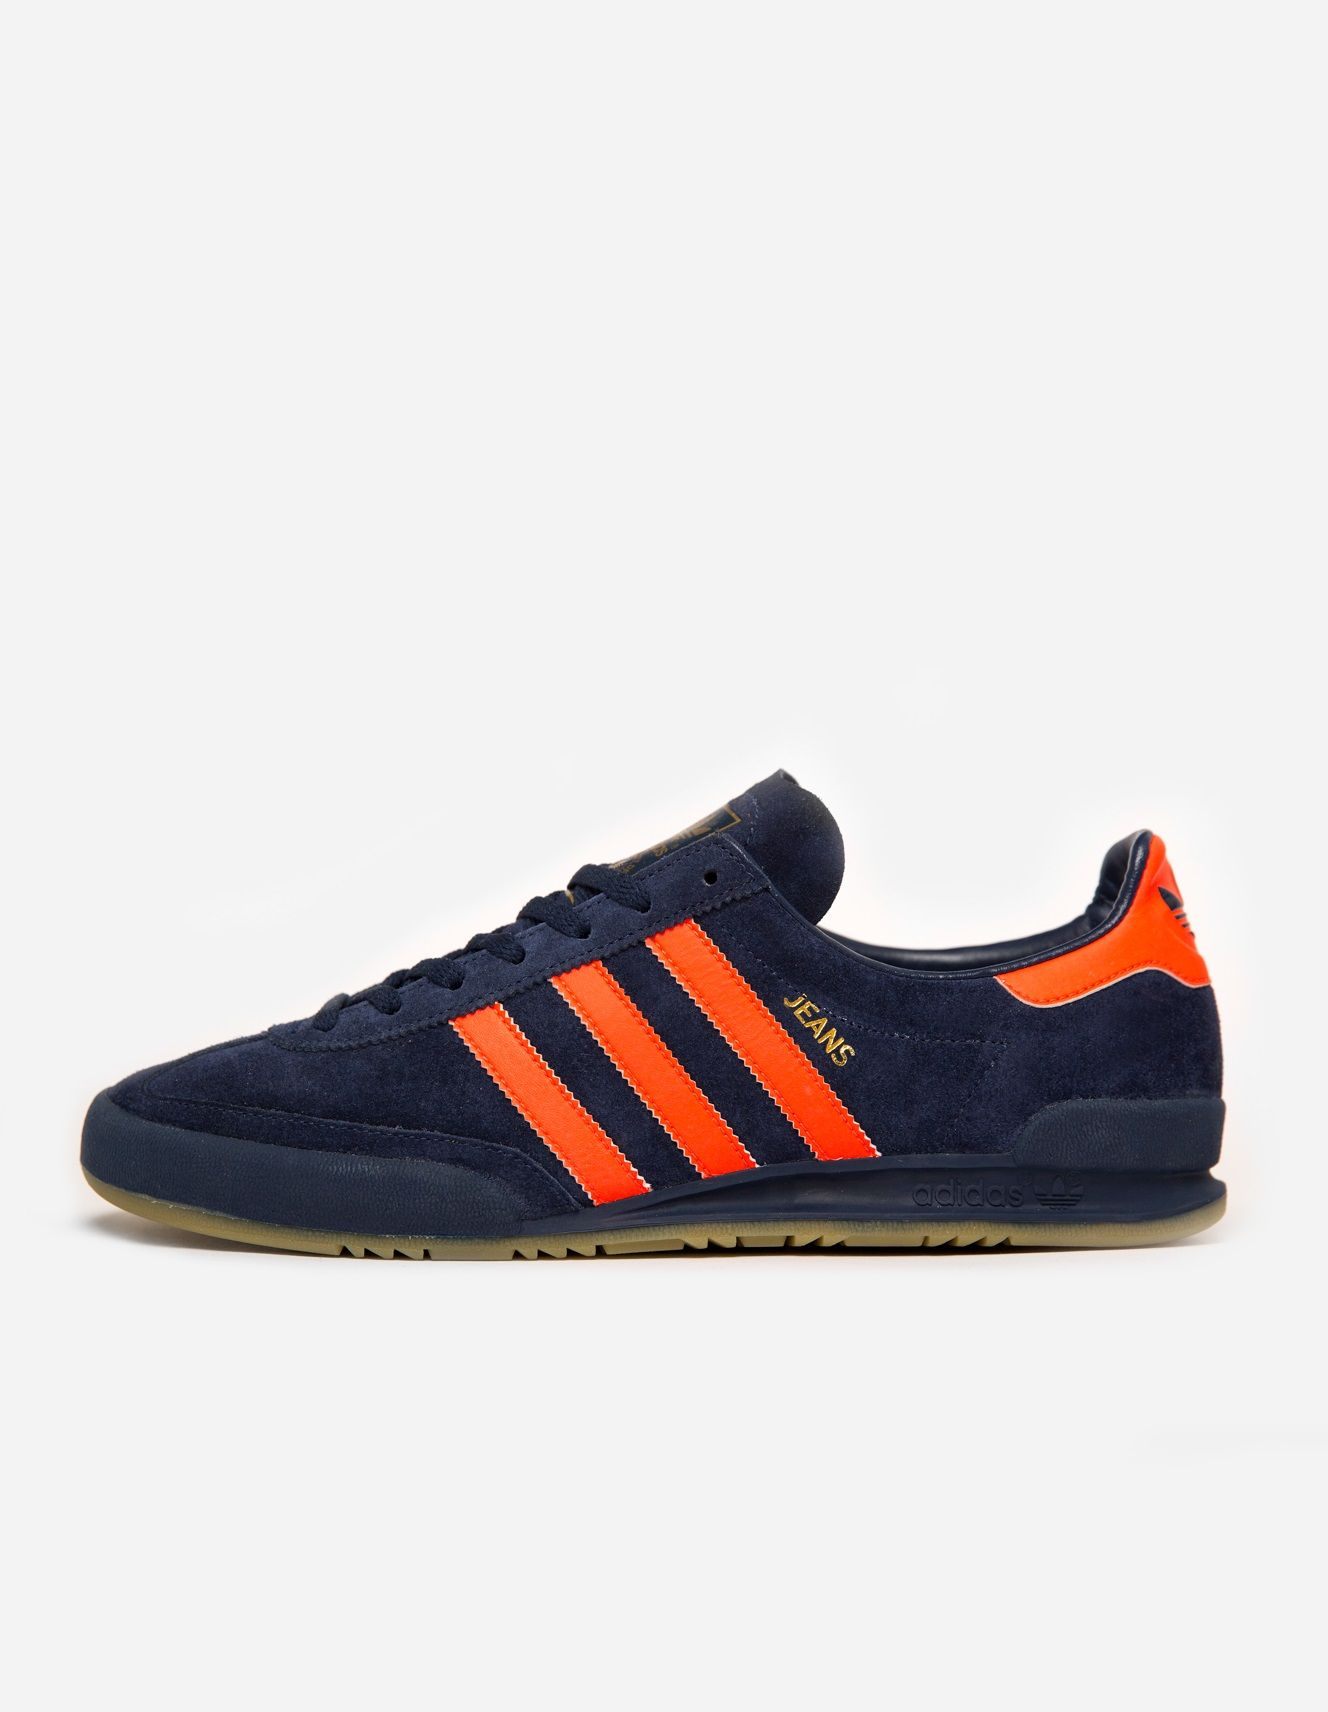 cheap for discount 128d6 d5933 Size  x adidas Originals Jeans MKII  Blue Orange